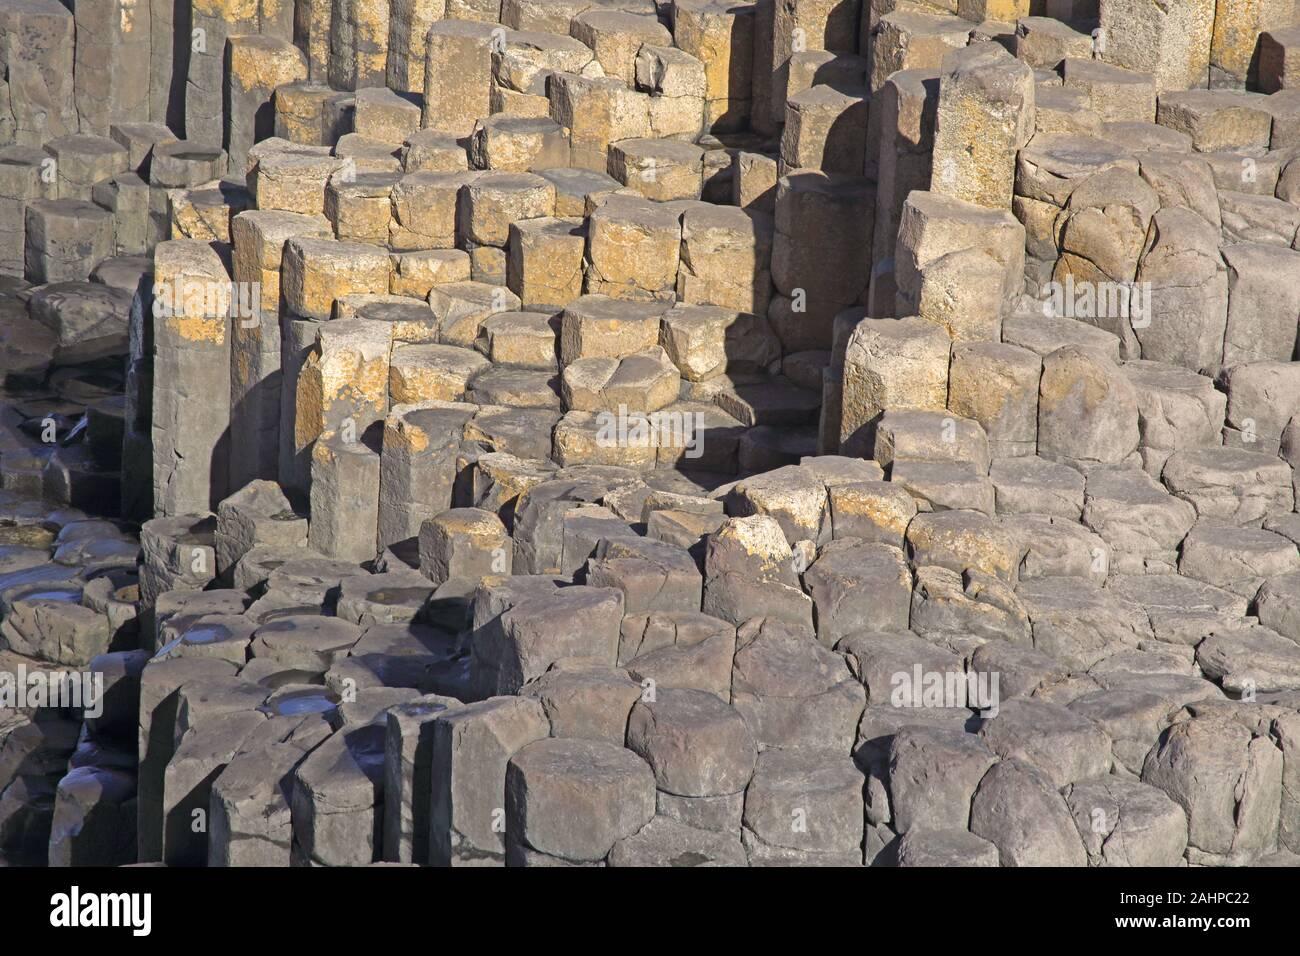 Massive basalt columns of the Giant's Causeway, County Antrim, Northern Ireland, UK. Stock Photo